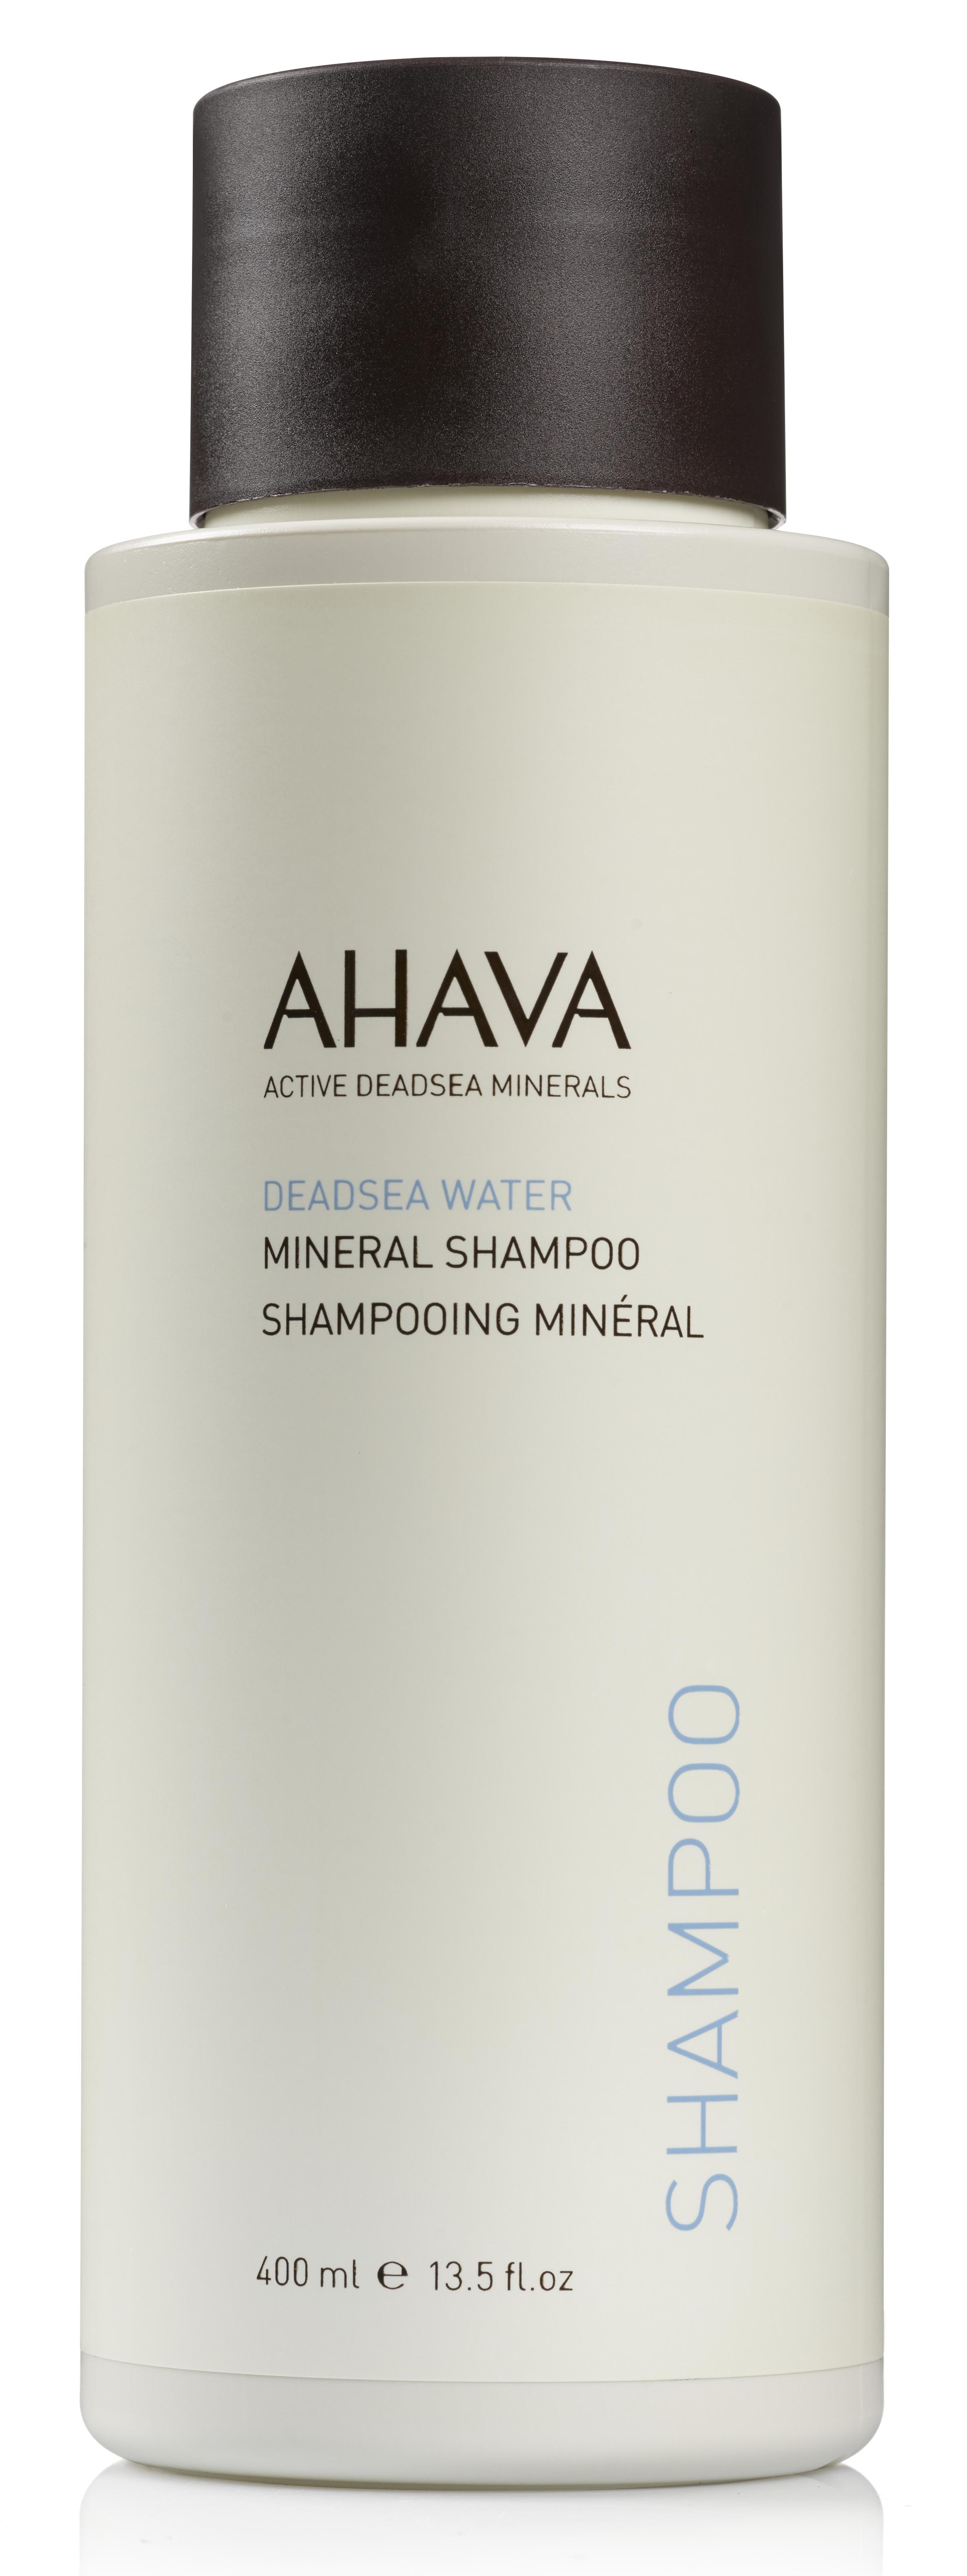 AHAVA Шампунь минеральный / Deadsea Water 400 мл -  Шампуни